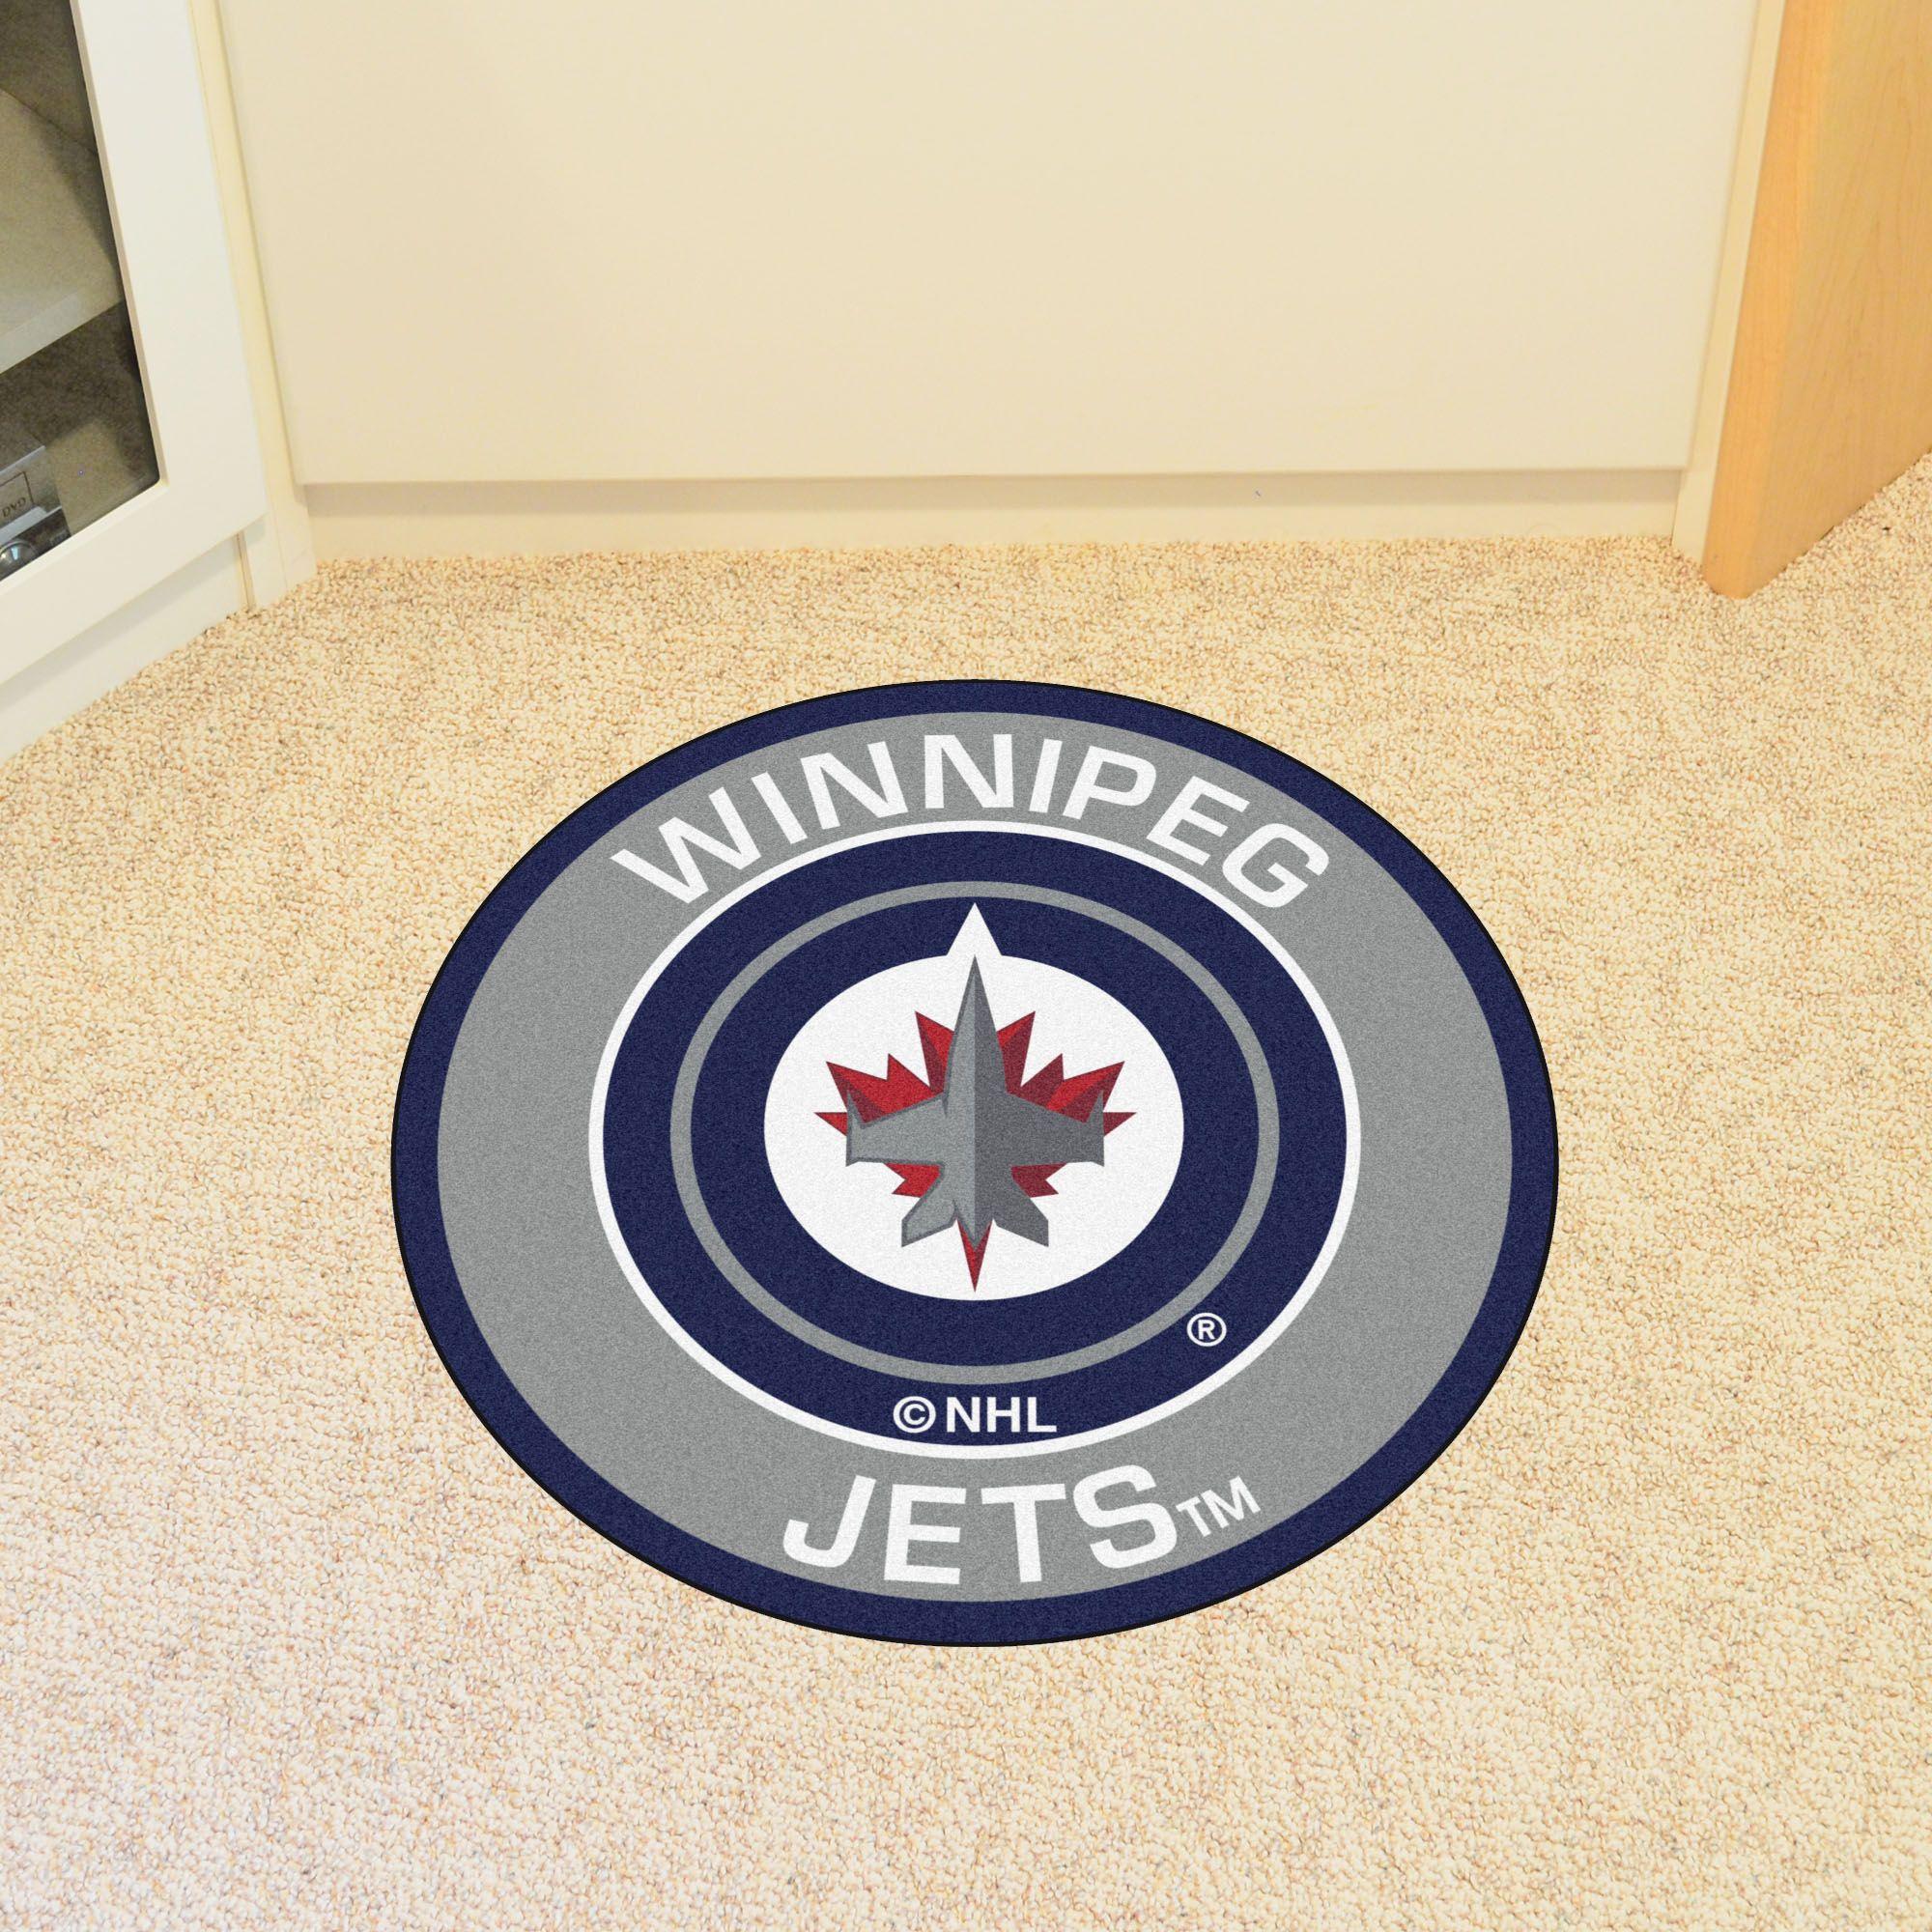 Winnipeg Jets Roundel Mat Floor Rugs